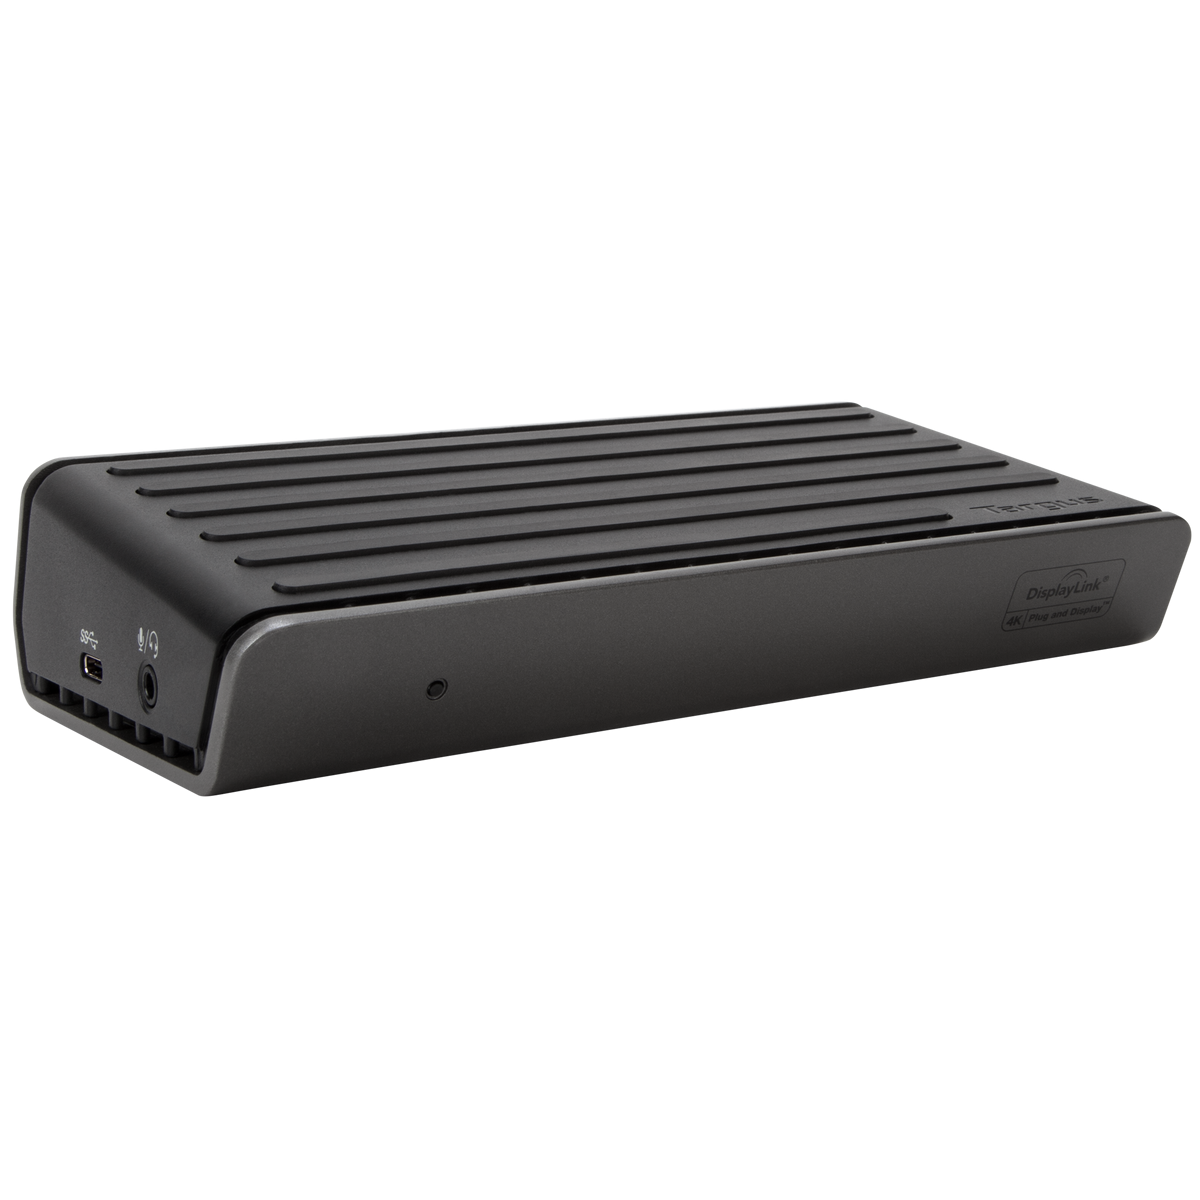 Targus USB-C Universal DV4K Docking Station with Power by Targus